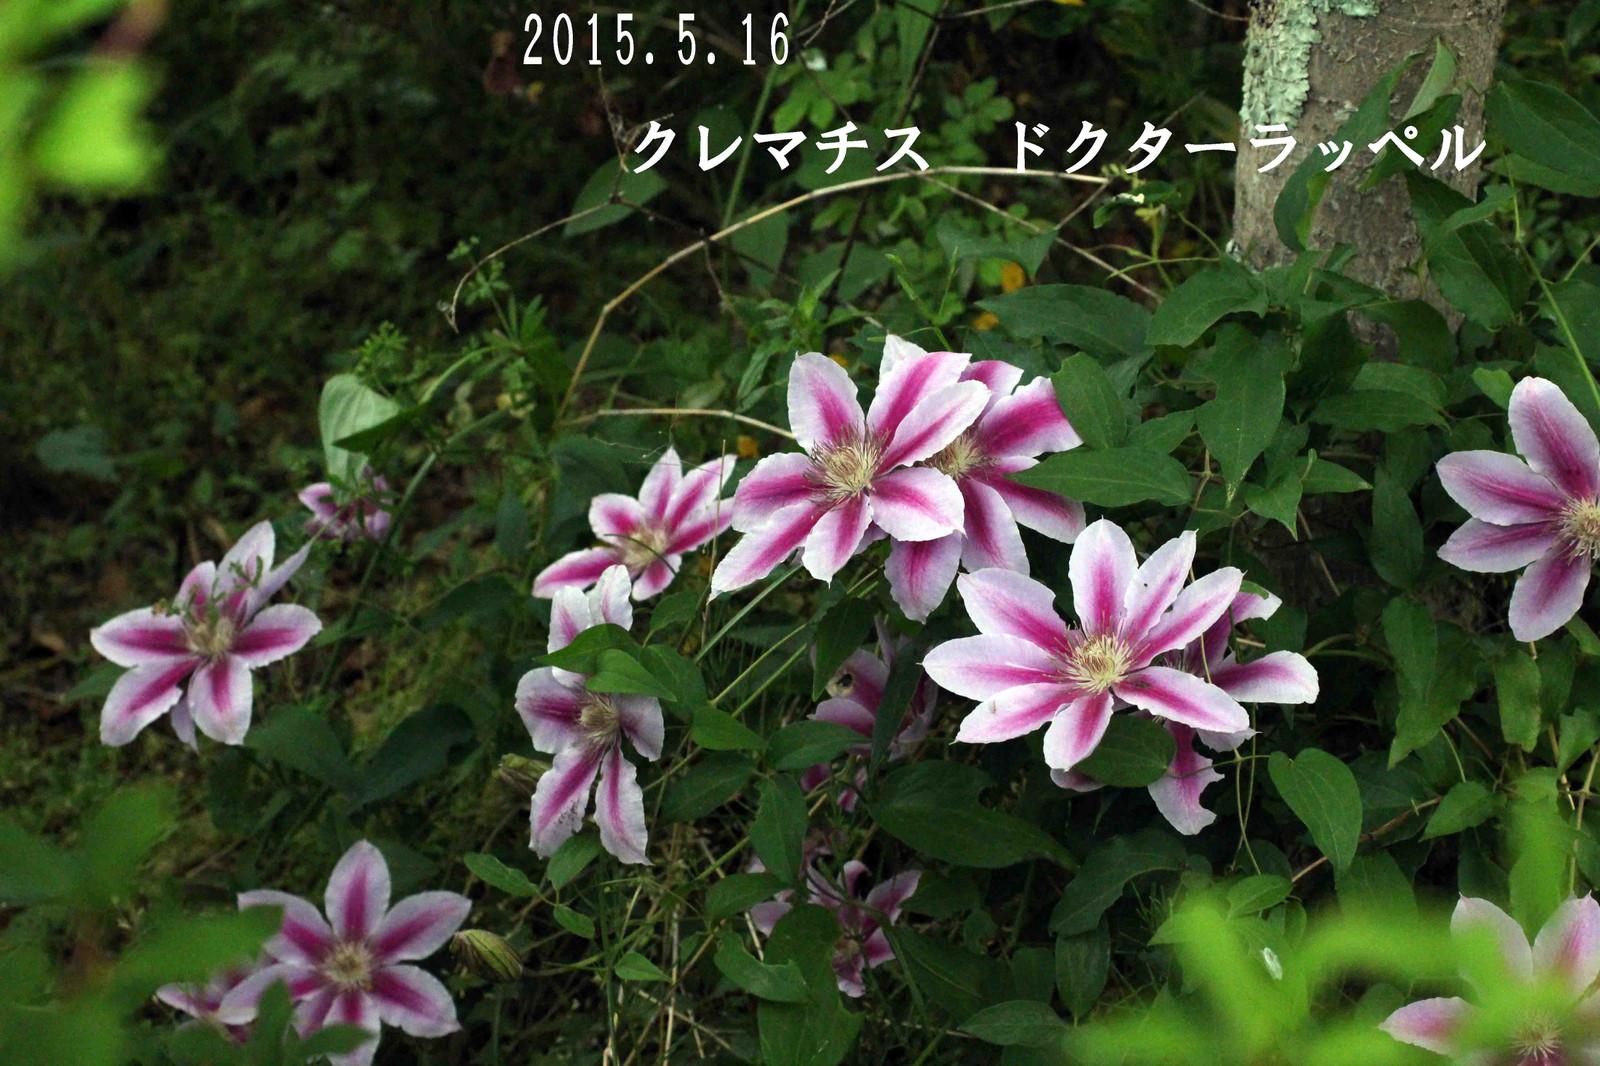 2015_05_16_9395_edited1